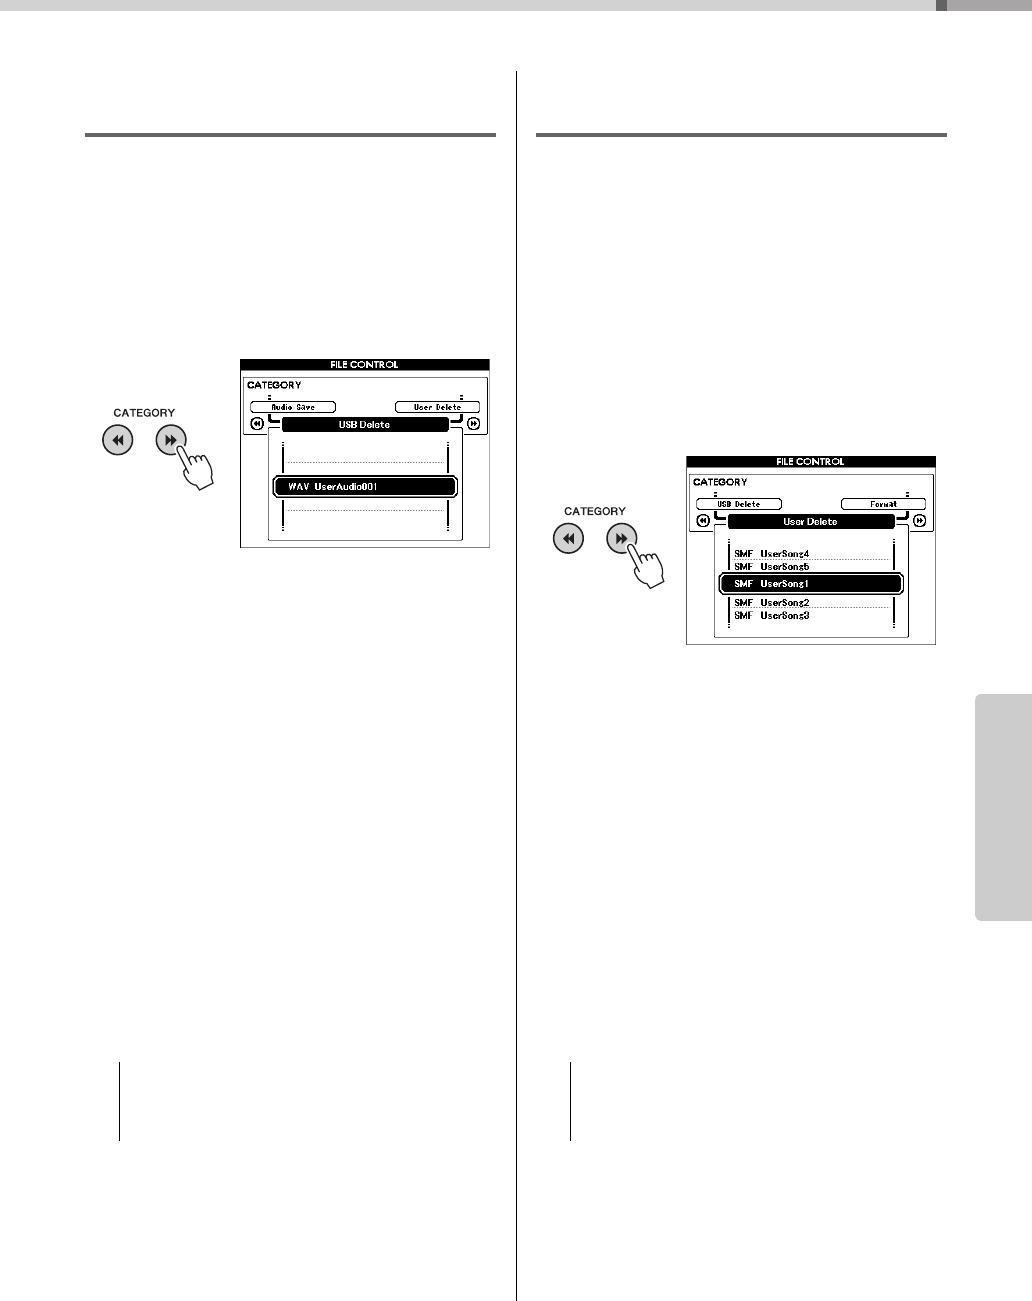 dxg technology dgx 660 owners manual download page 87 rh rsmanuals com DXG Camcorder Manual DXG Model 305V